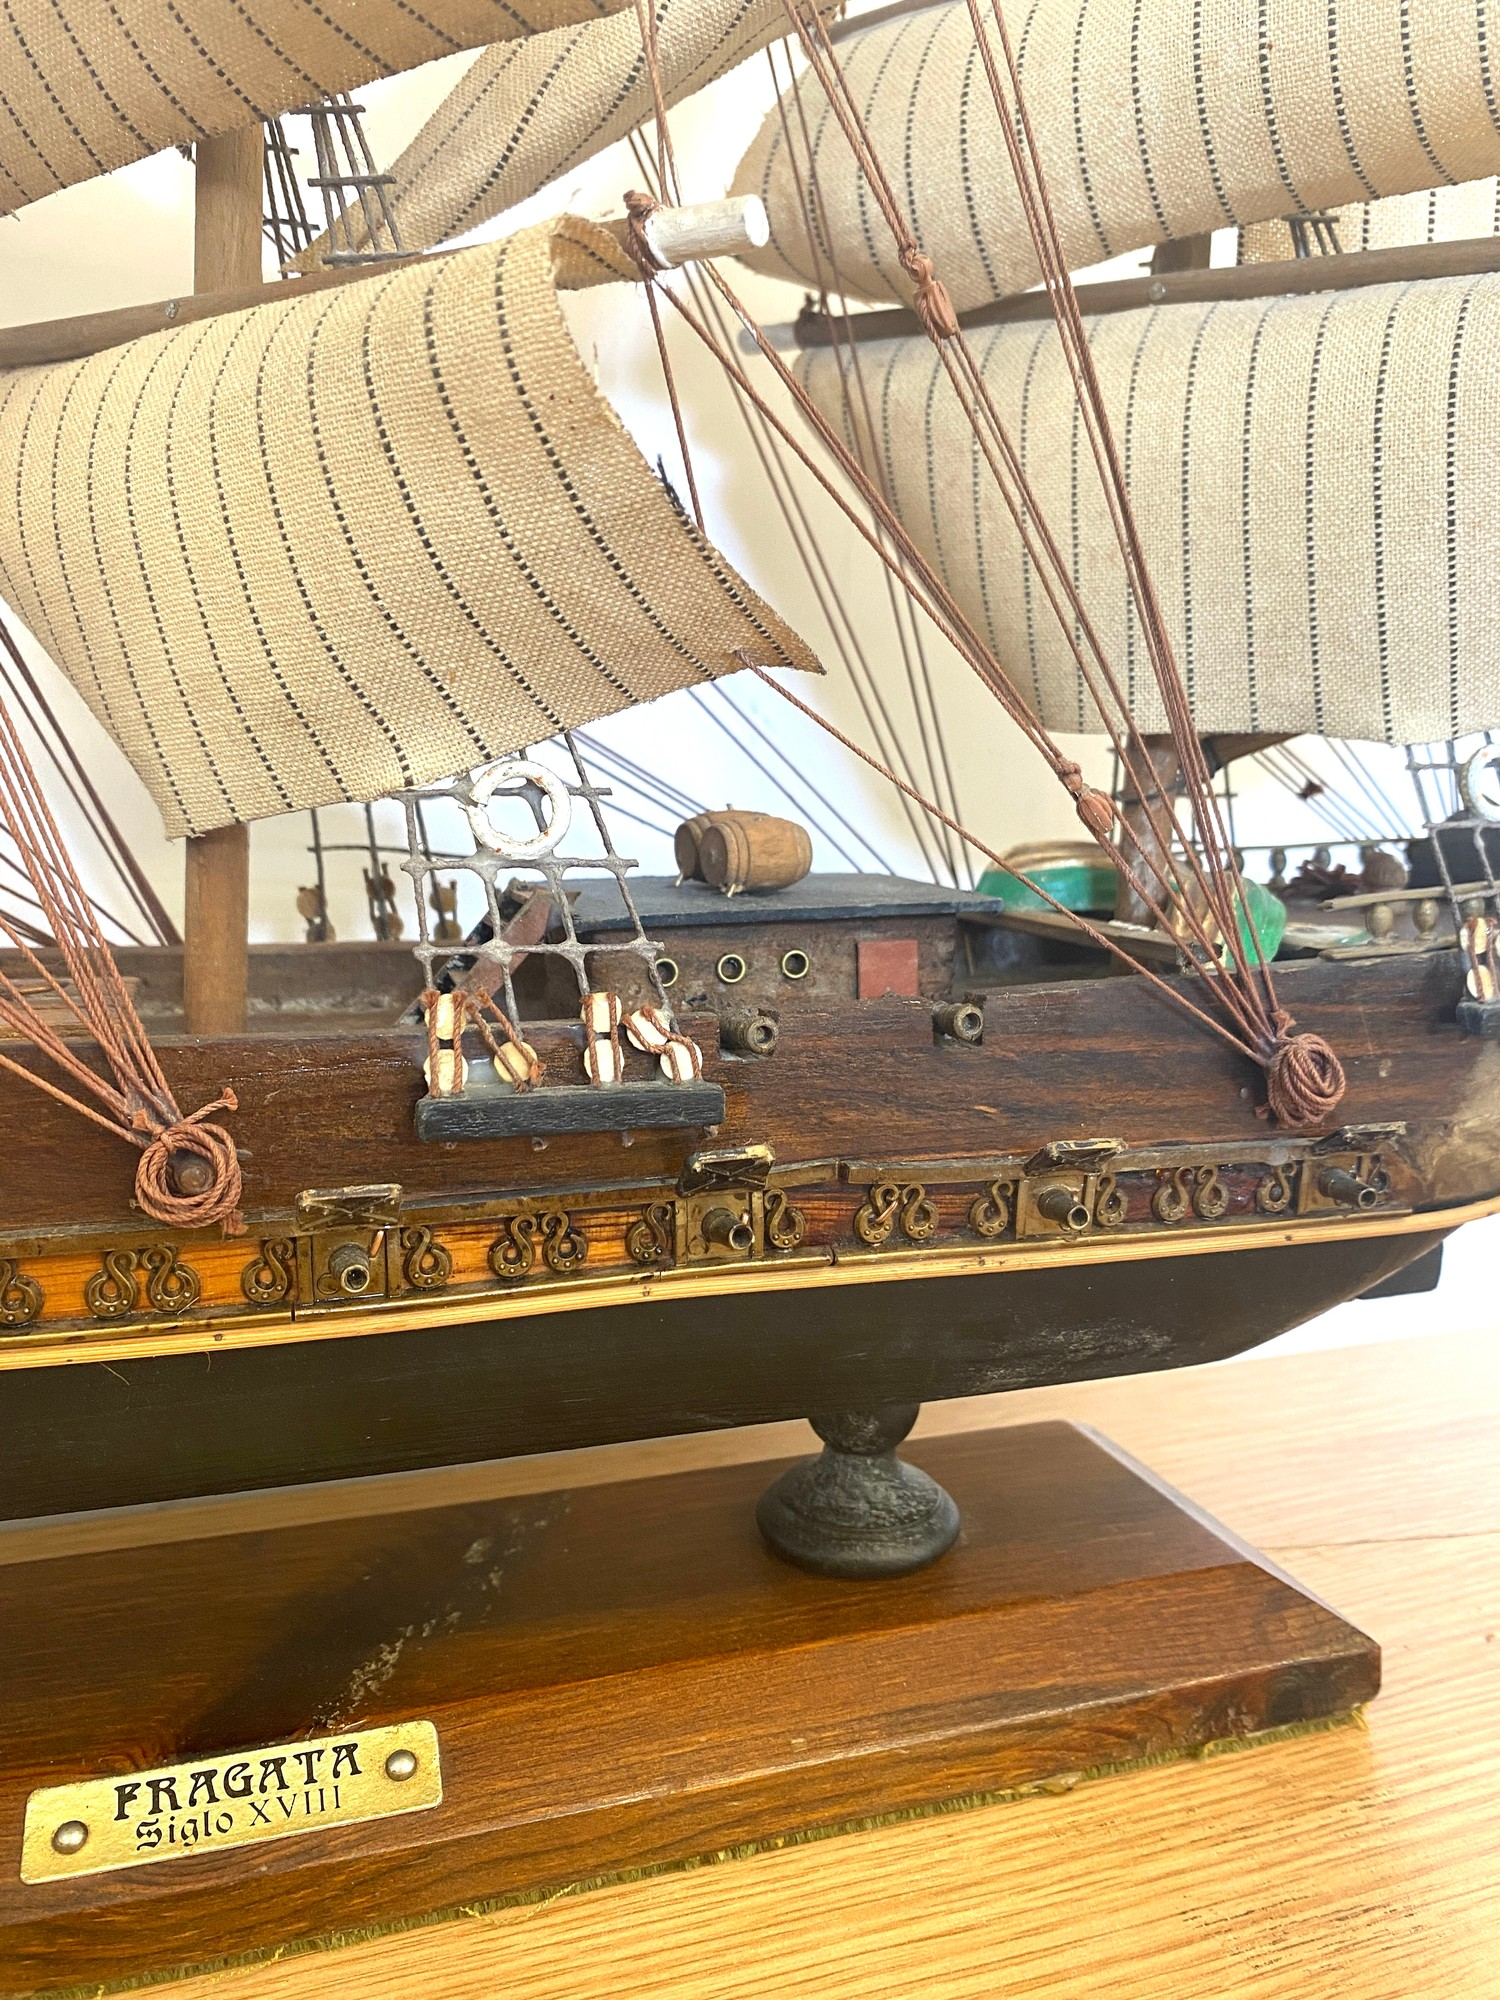 Model galleon Fragata siglo - Image 3 of 4